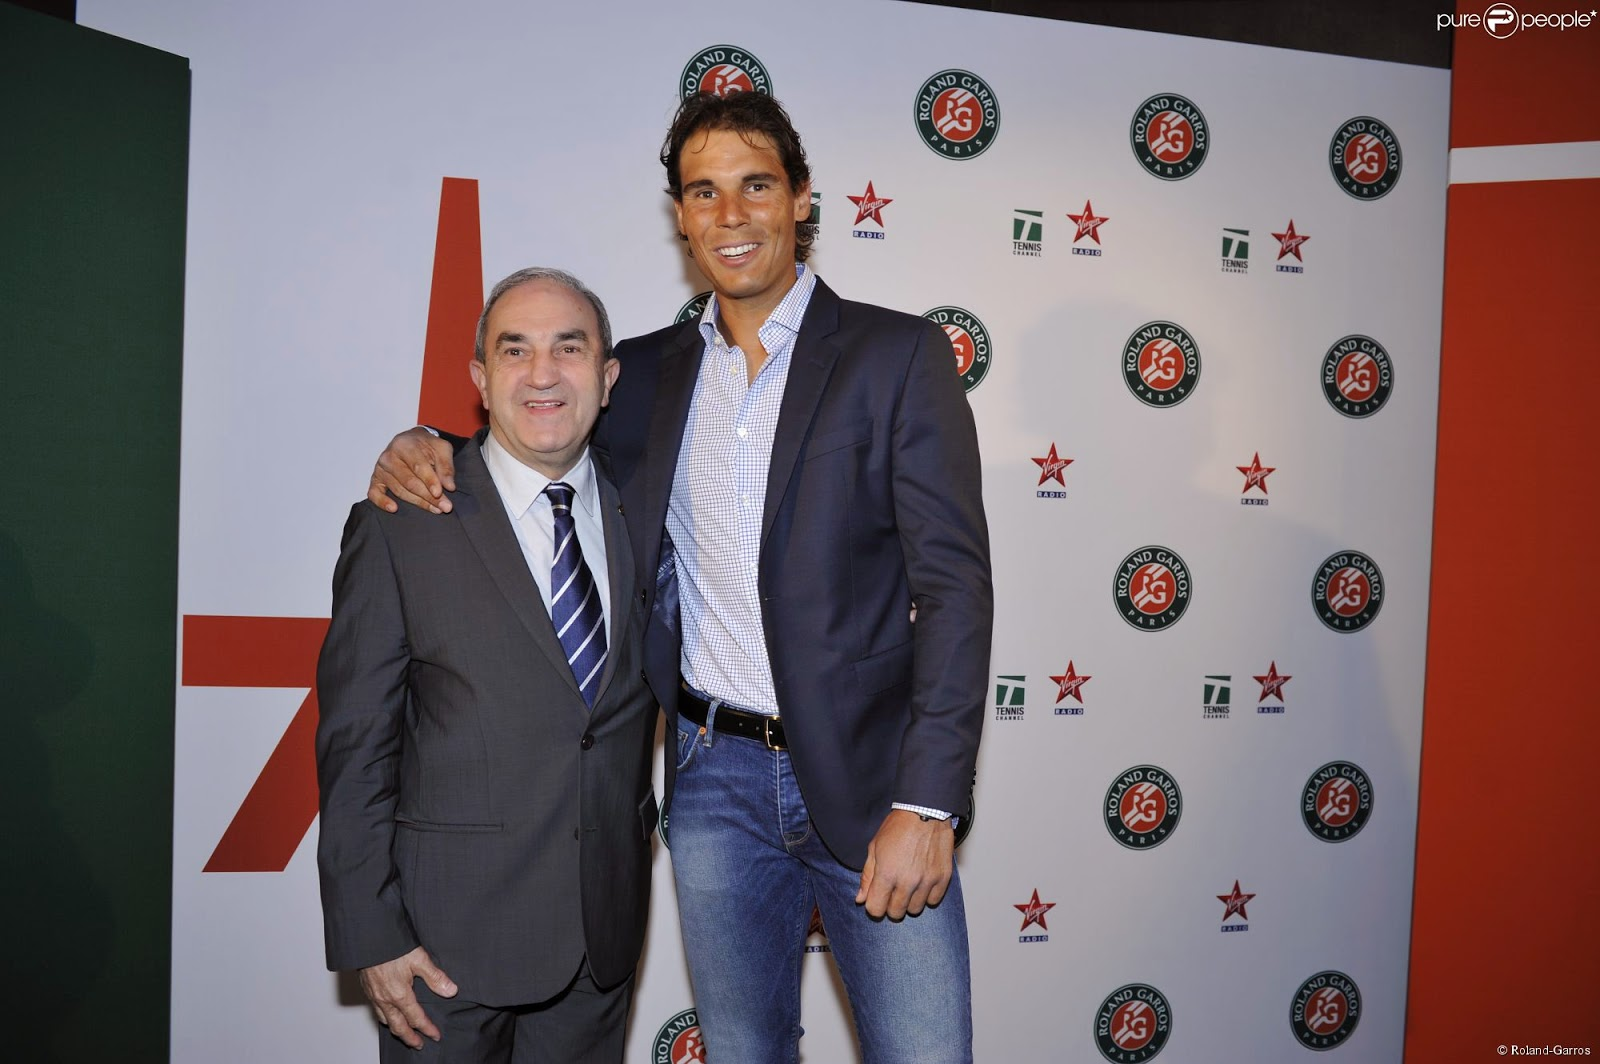 Roland Garros/PurePeople